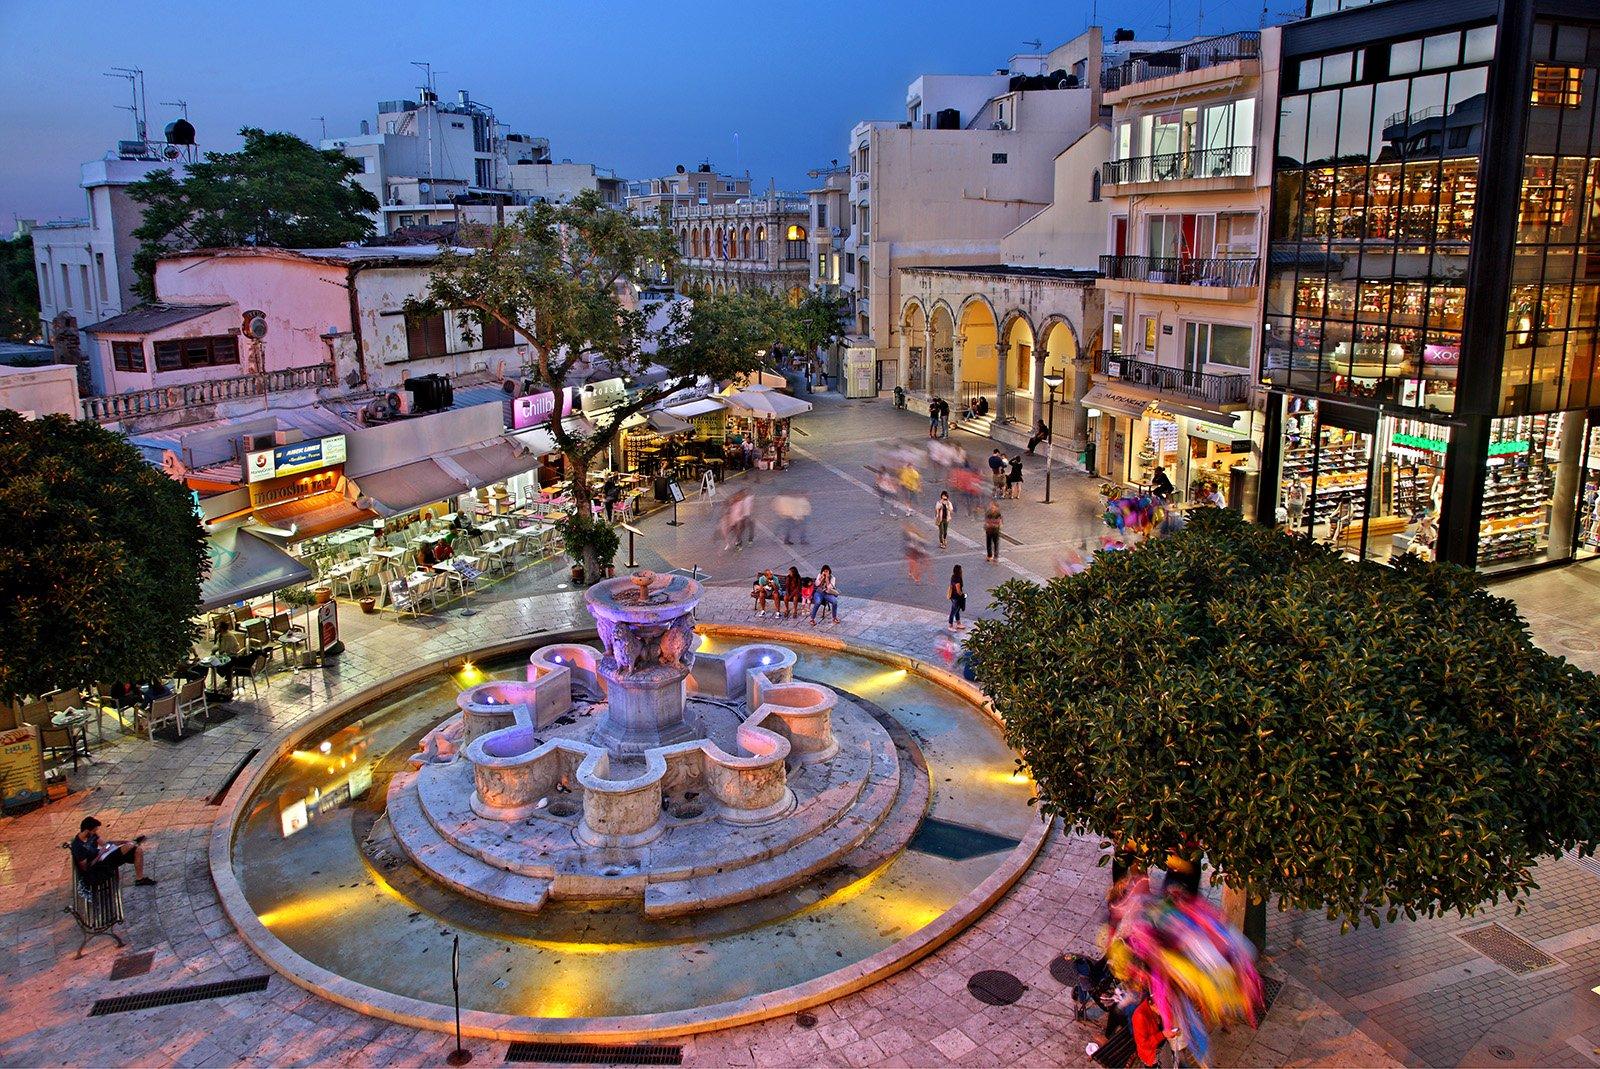 Top Attractions on Crete, Greece - Heraklion Old Town © Heracles Kritikos, Shutterstock